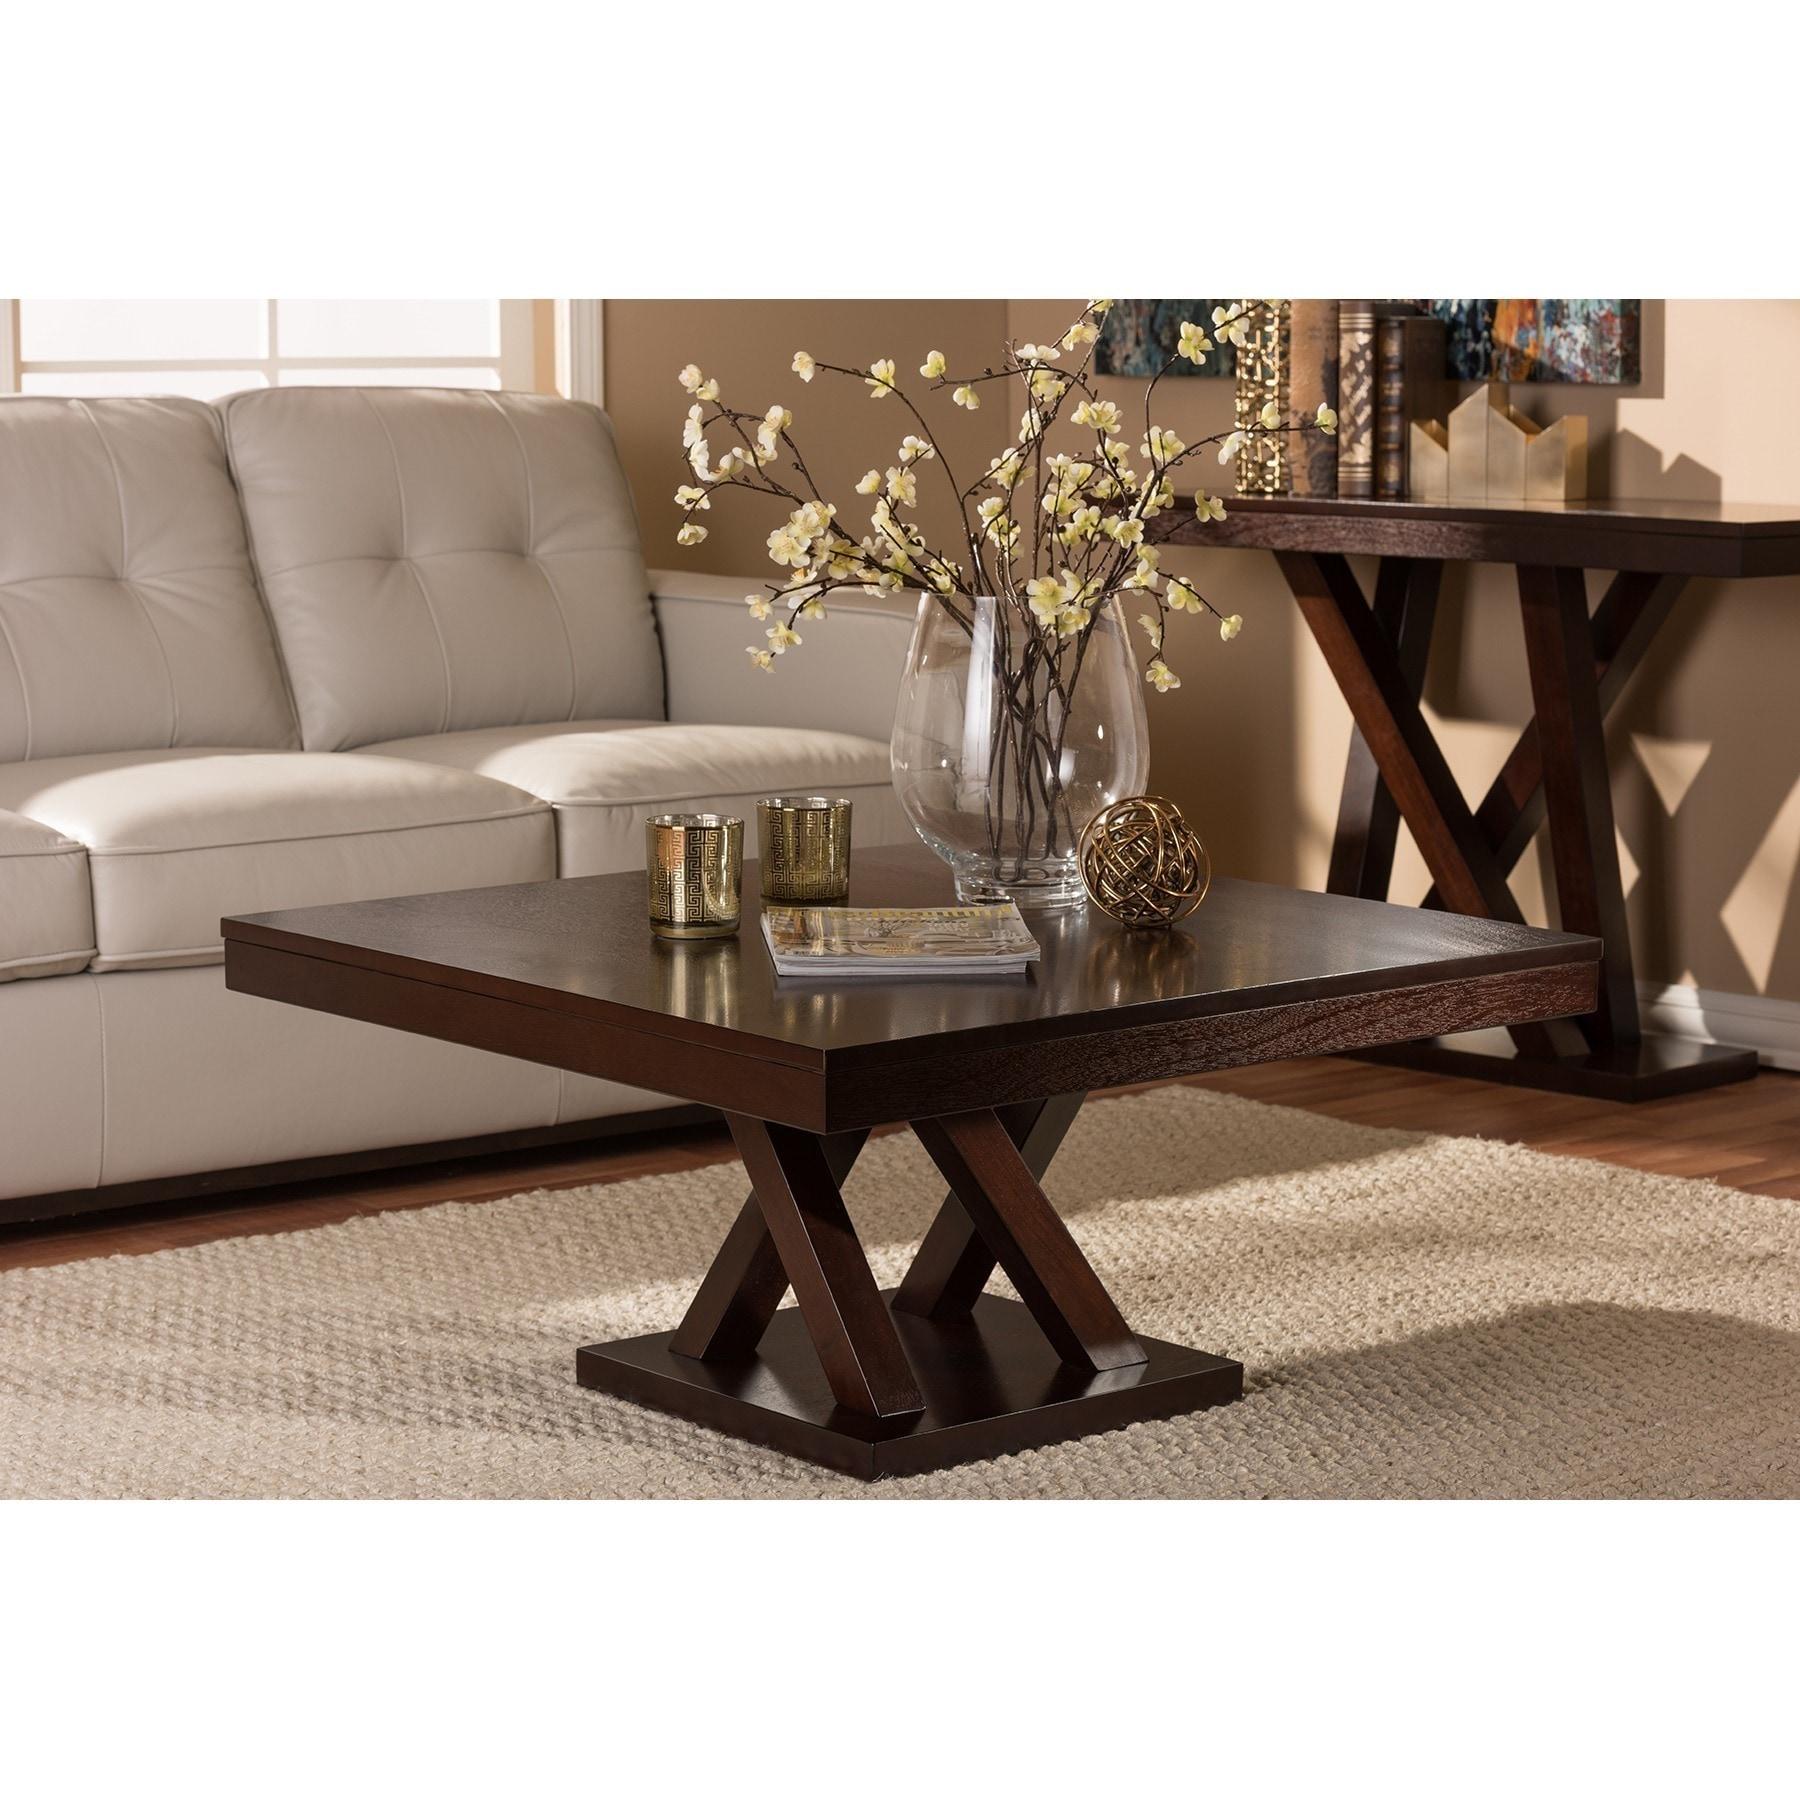 - Shop Modern Dark Brown Coffee Table By Baxton Studio - Overstock